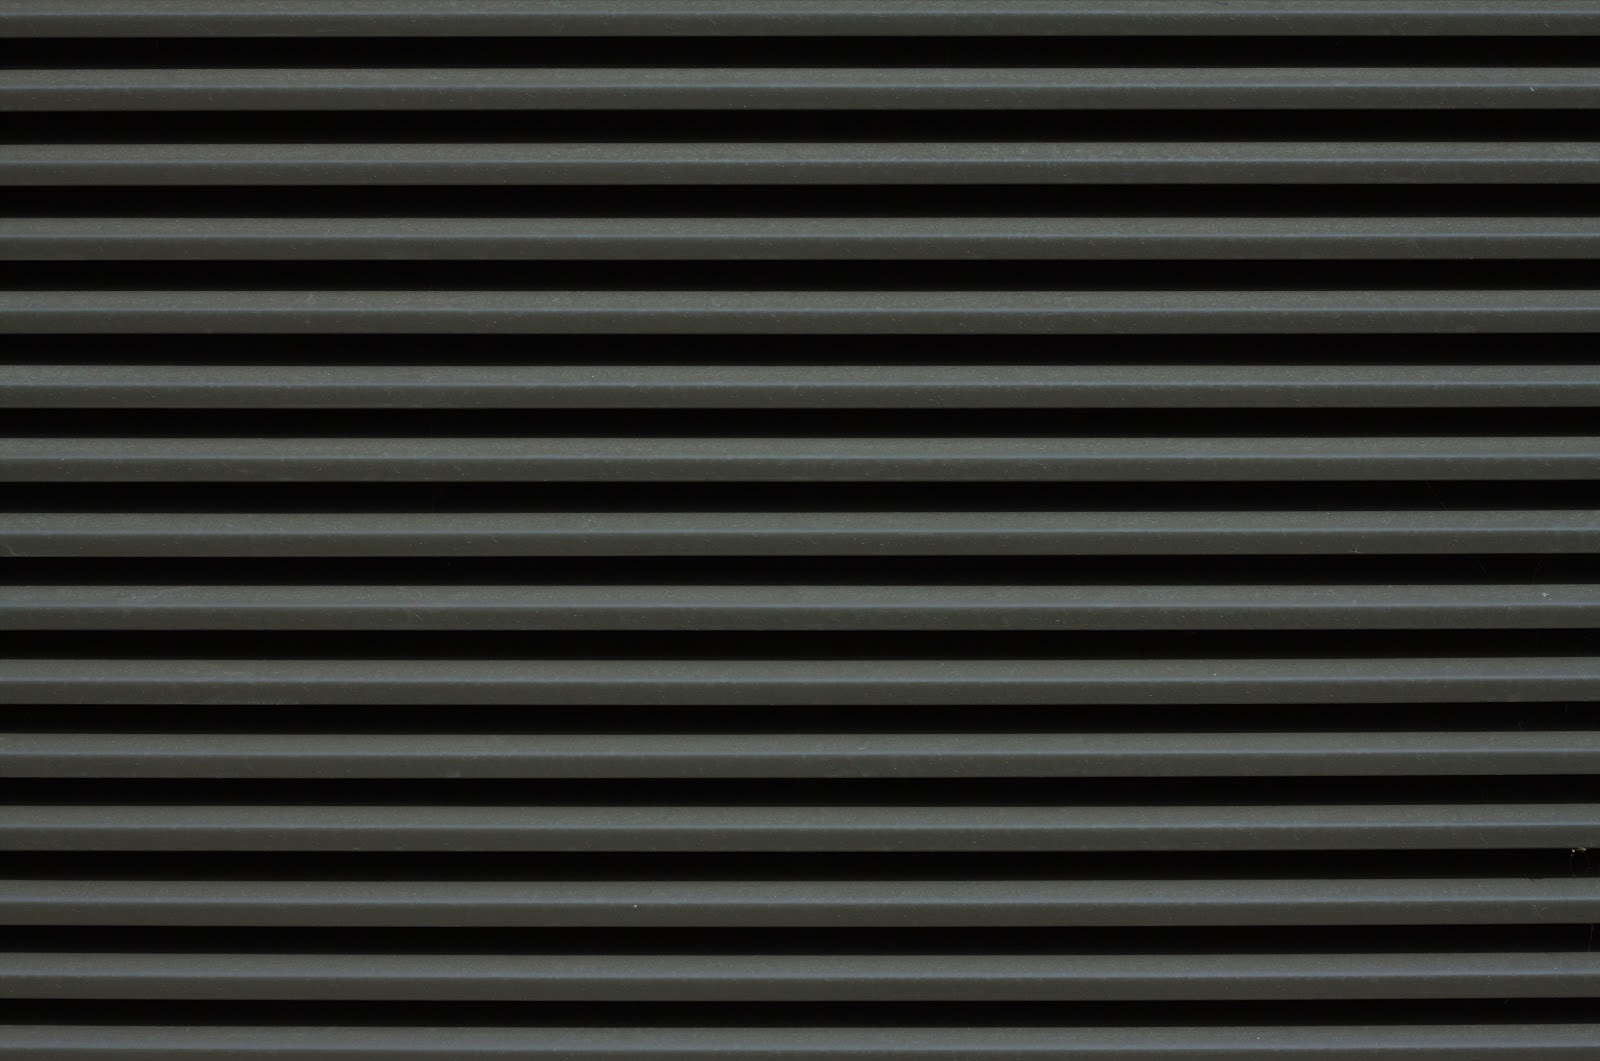 Metal grill texture 4750x3150